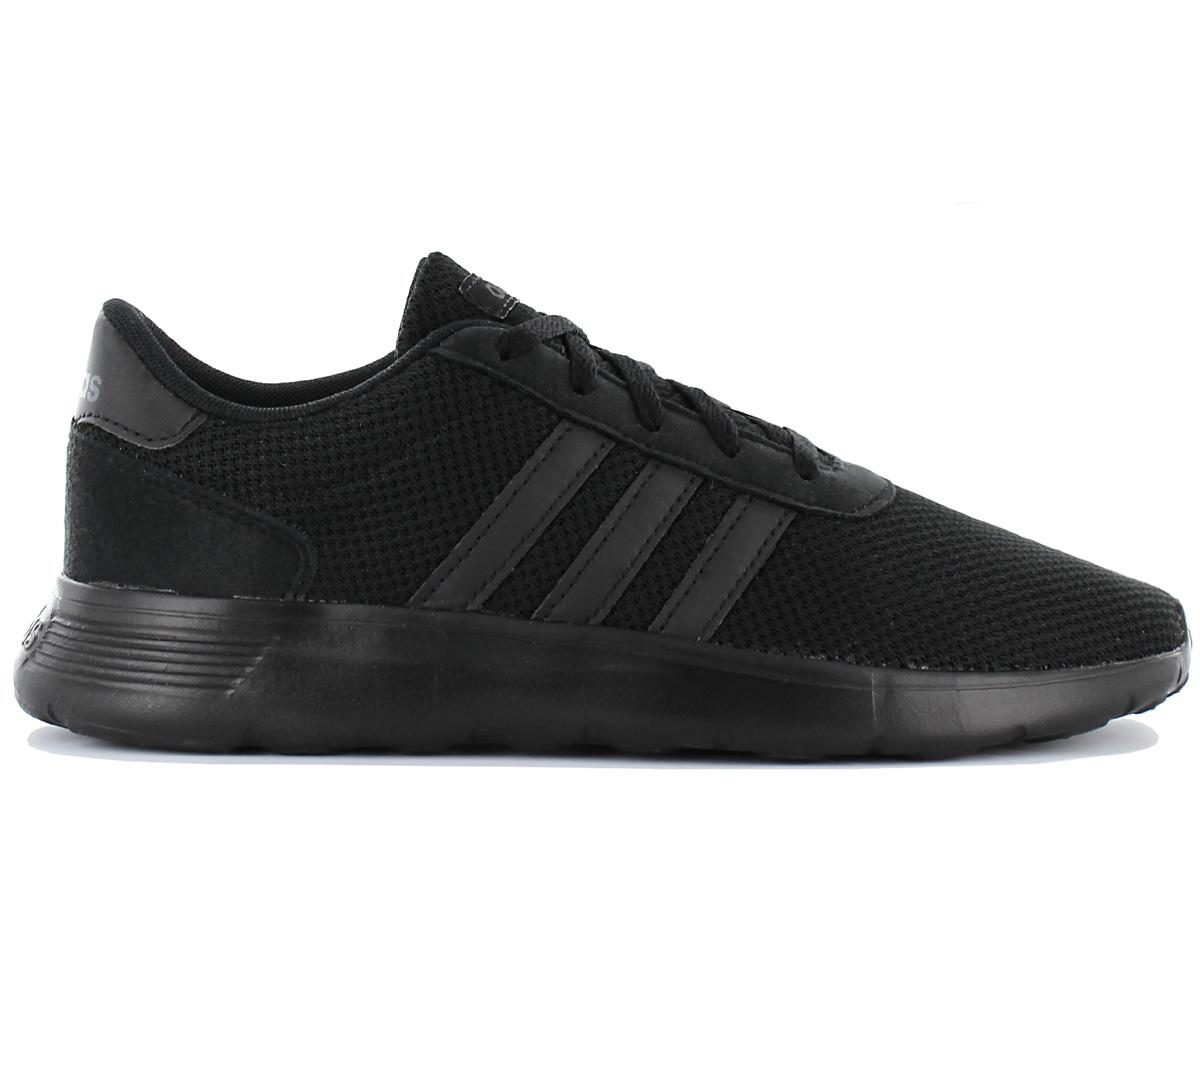 Adidas Lite Racer K Damens's Damens's Damens's Athletic Schuhes SNEAKERS Bc0073 5     40d036